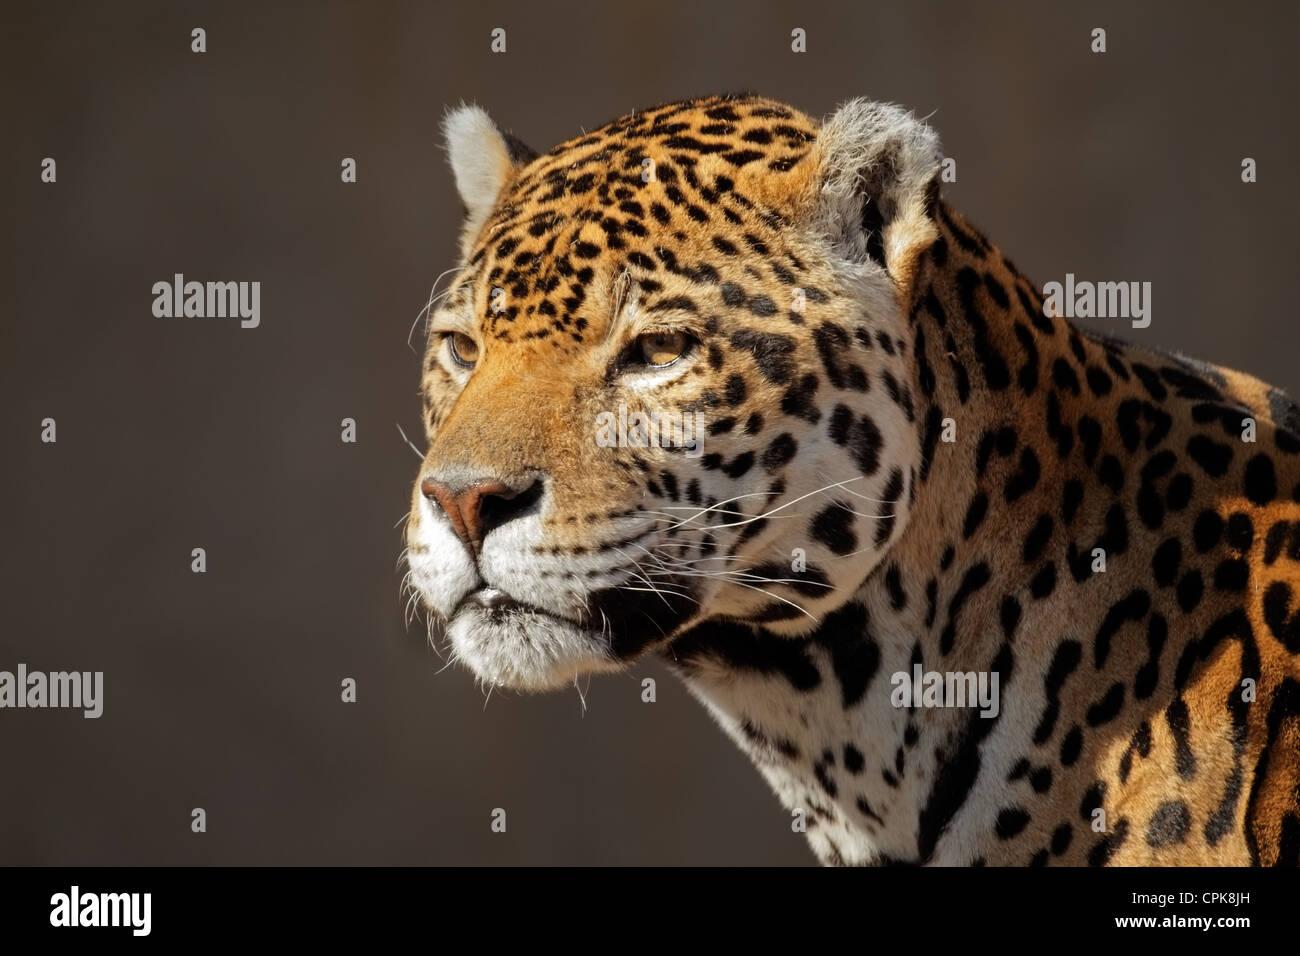 Porträt eines männlichen Jaguars (Panthera Onca) Stockbild